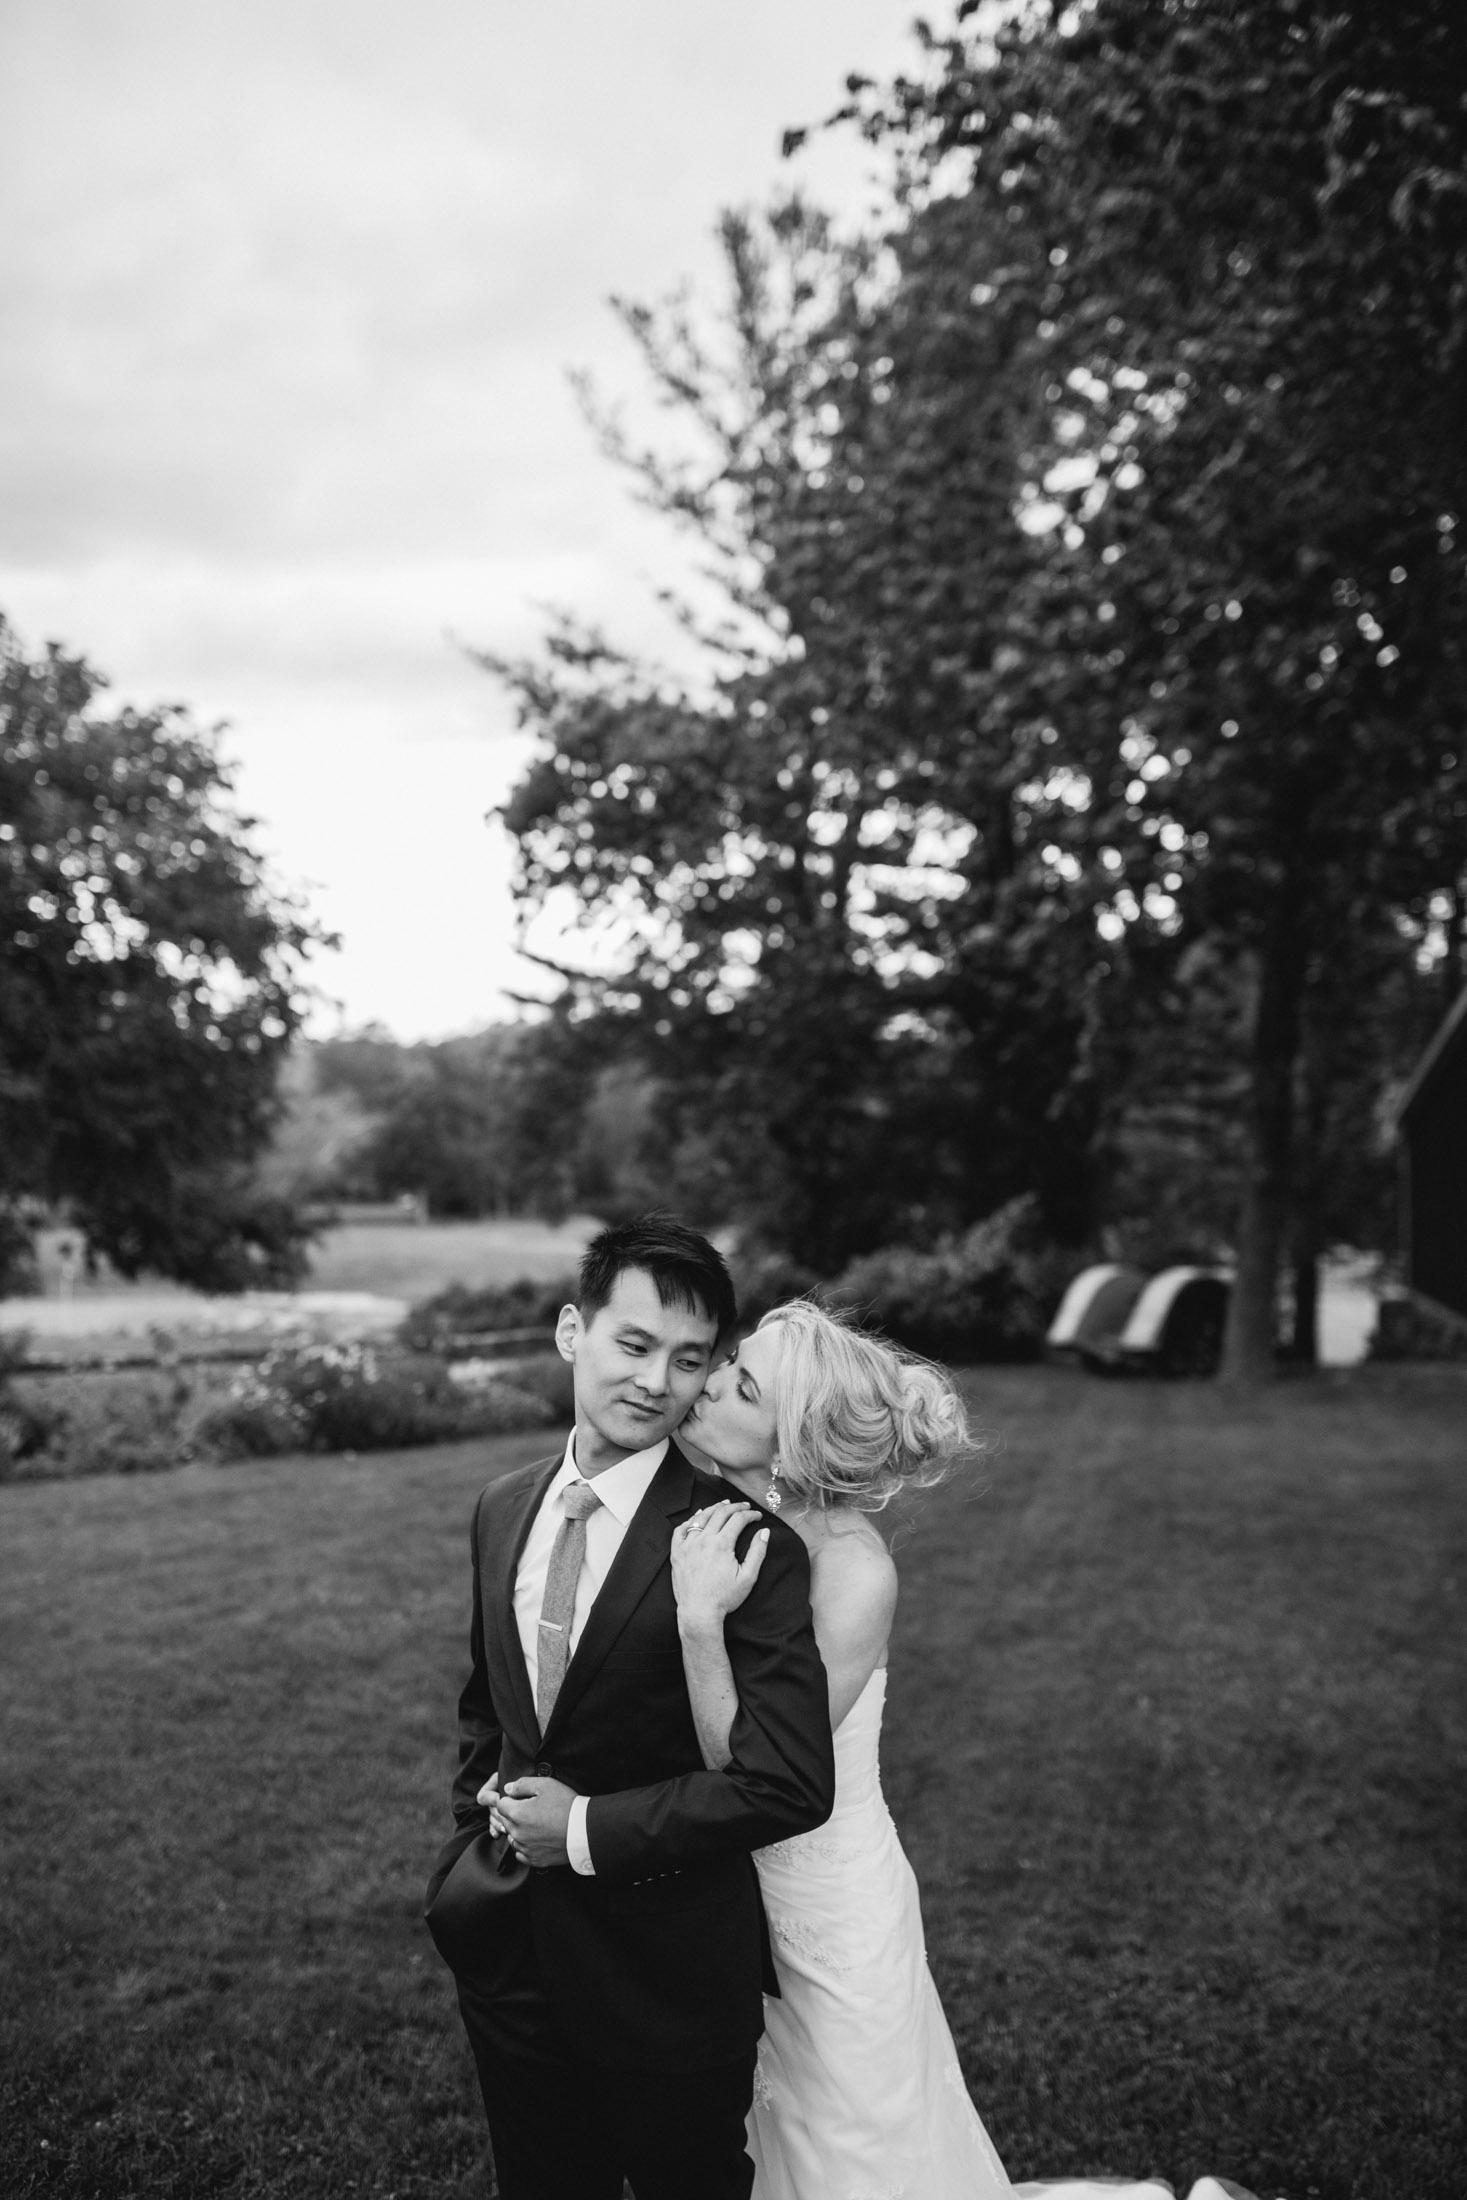 Blissful-Meadows-wedding-20.jpg